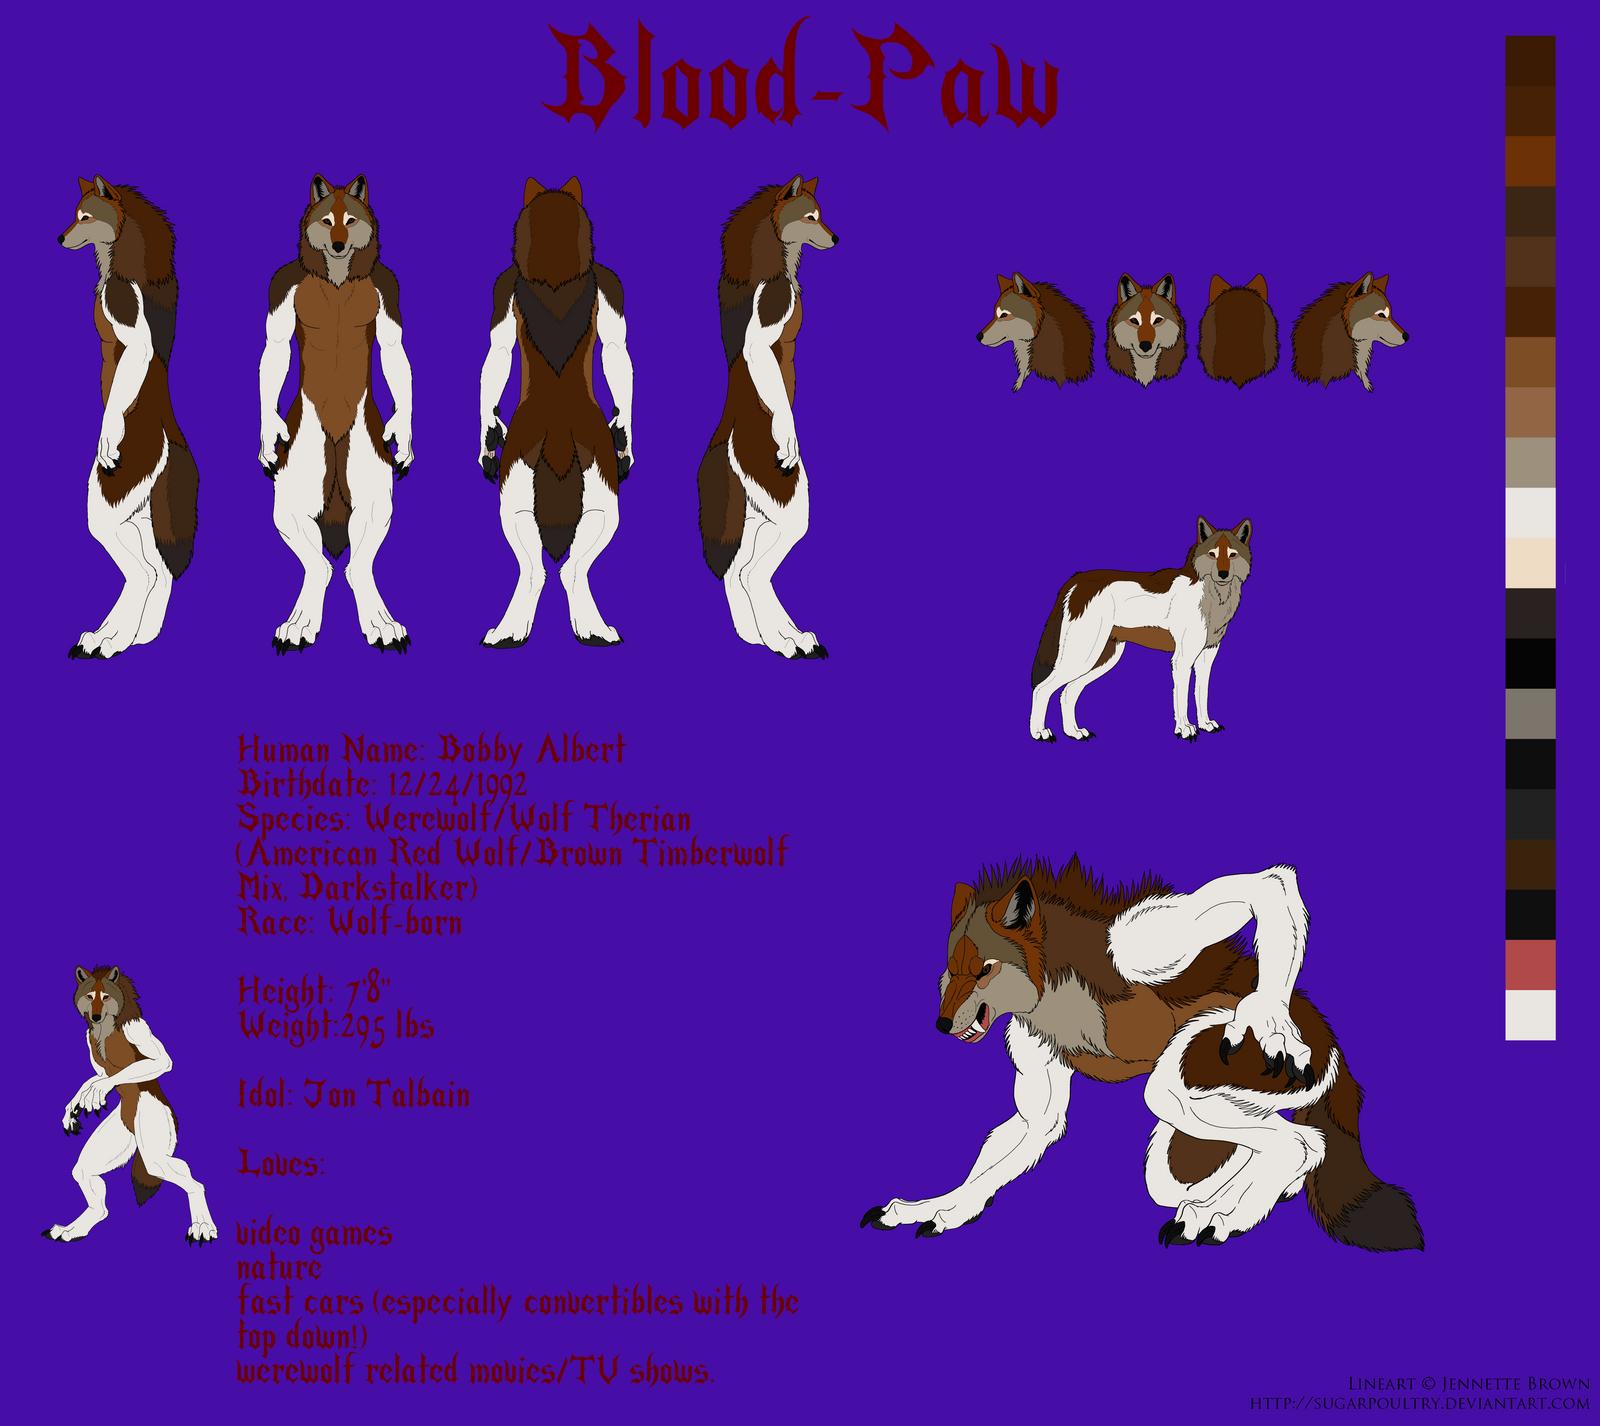 Blood-Paw: Ref Sheet (Updated) by Blood-PawWerewolf